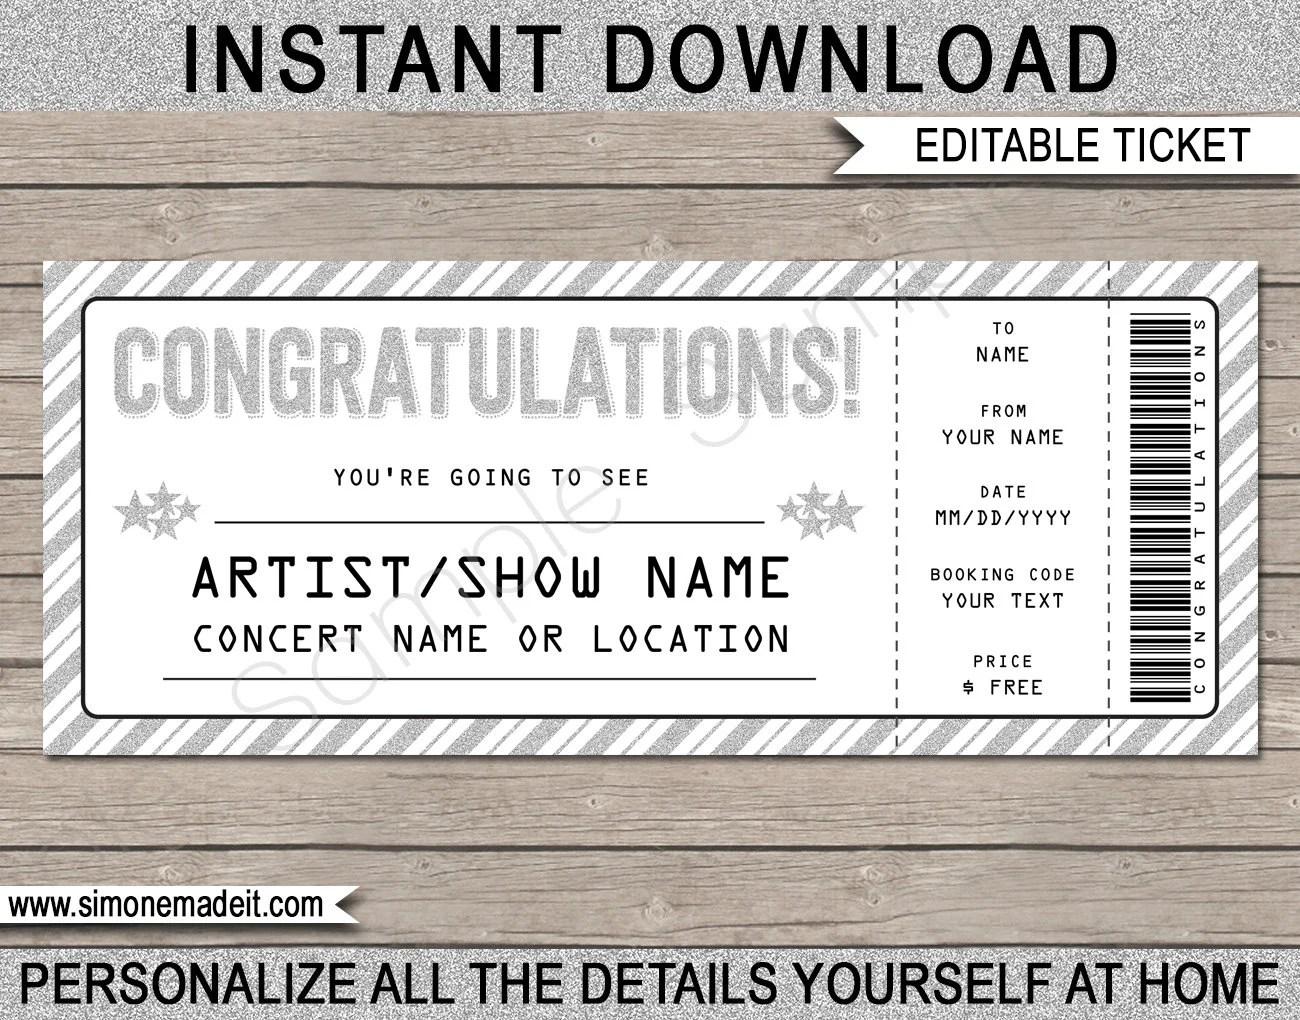 Congratulations Gift Concert Ticket - Printable Gift Voucher